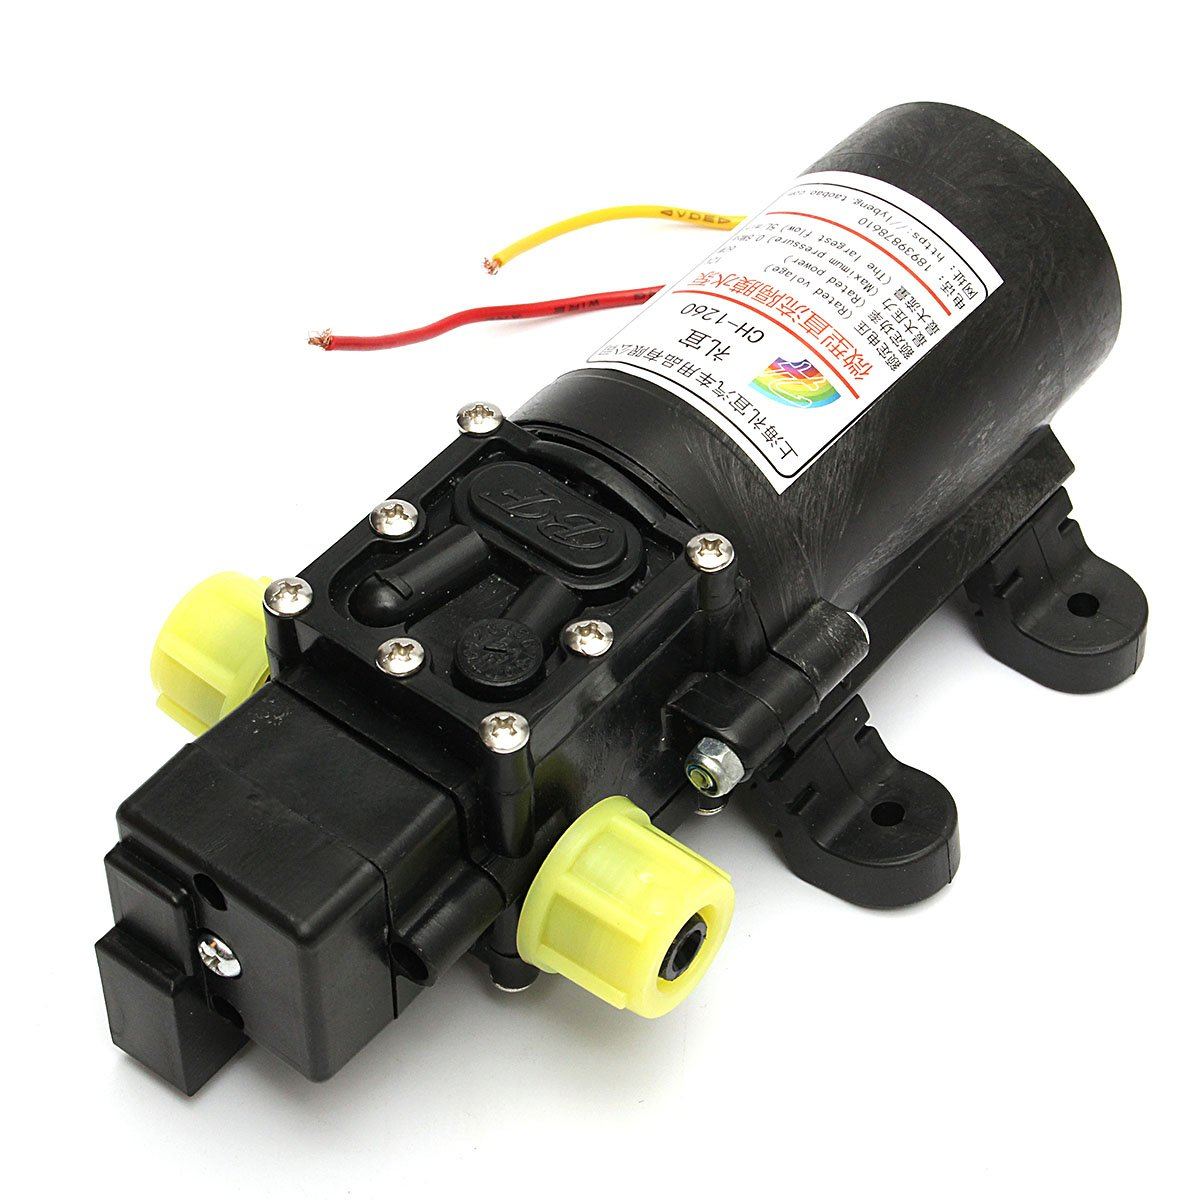 12V High Power Electric Auto Diaphragm Water Pump 5L/min 100 PSI Pressure Switch